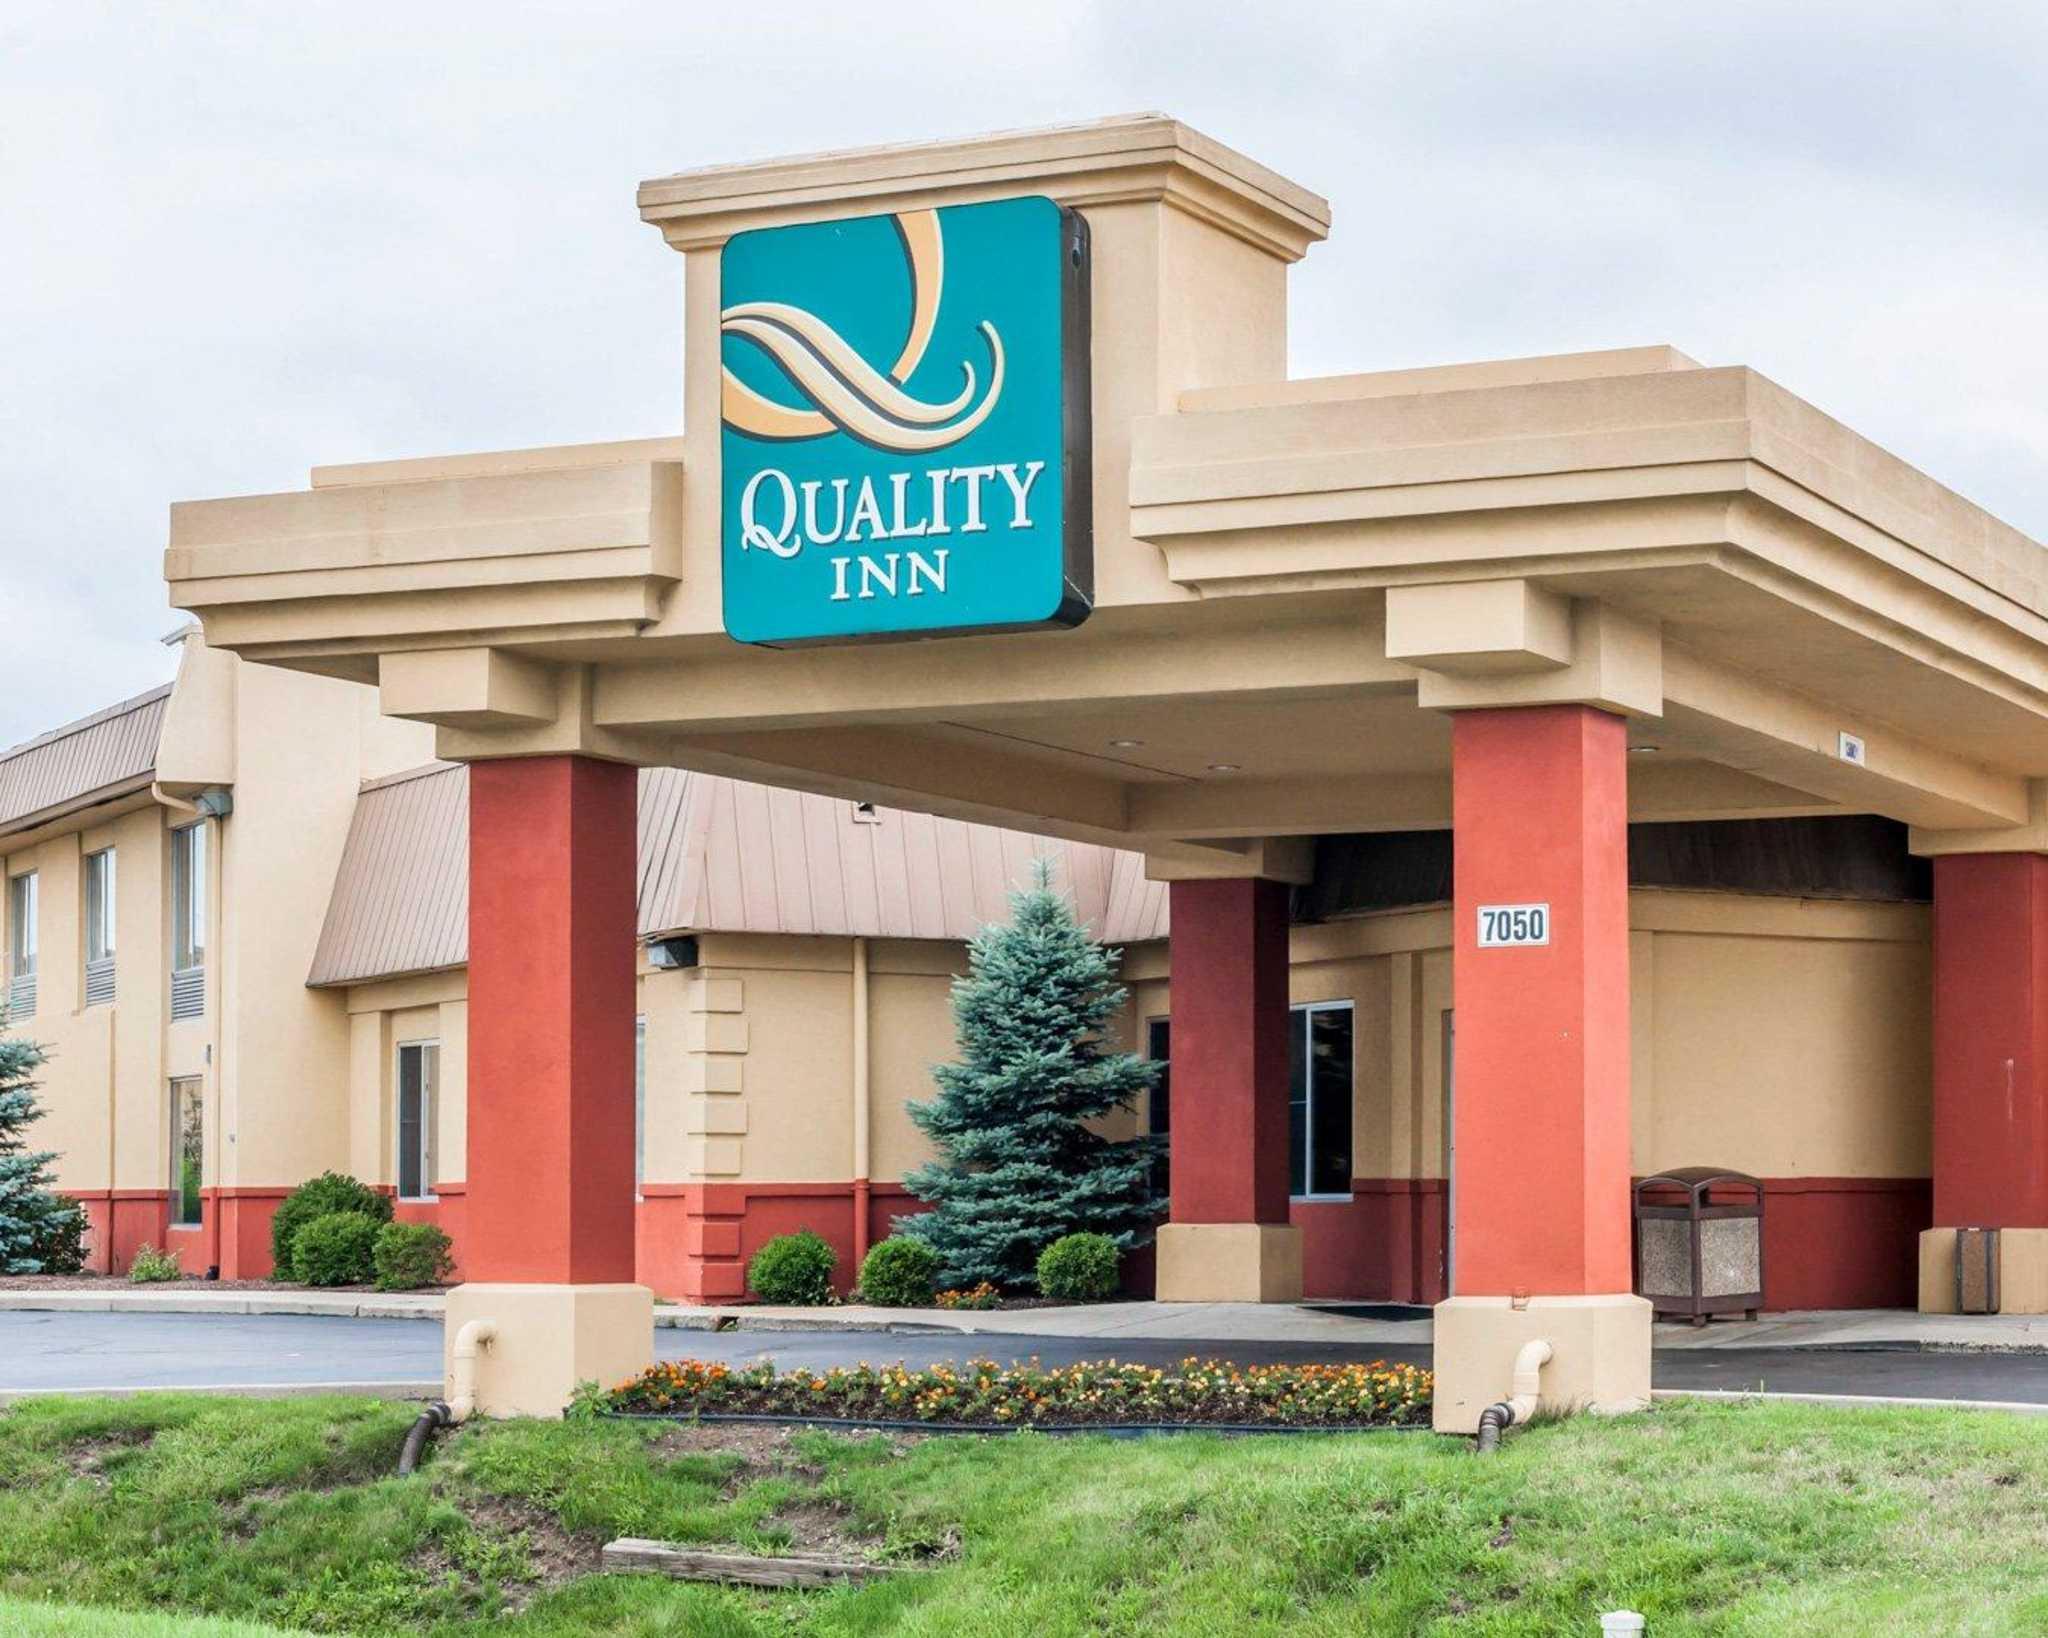 Quality Inn East image 1